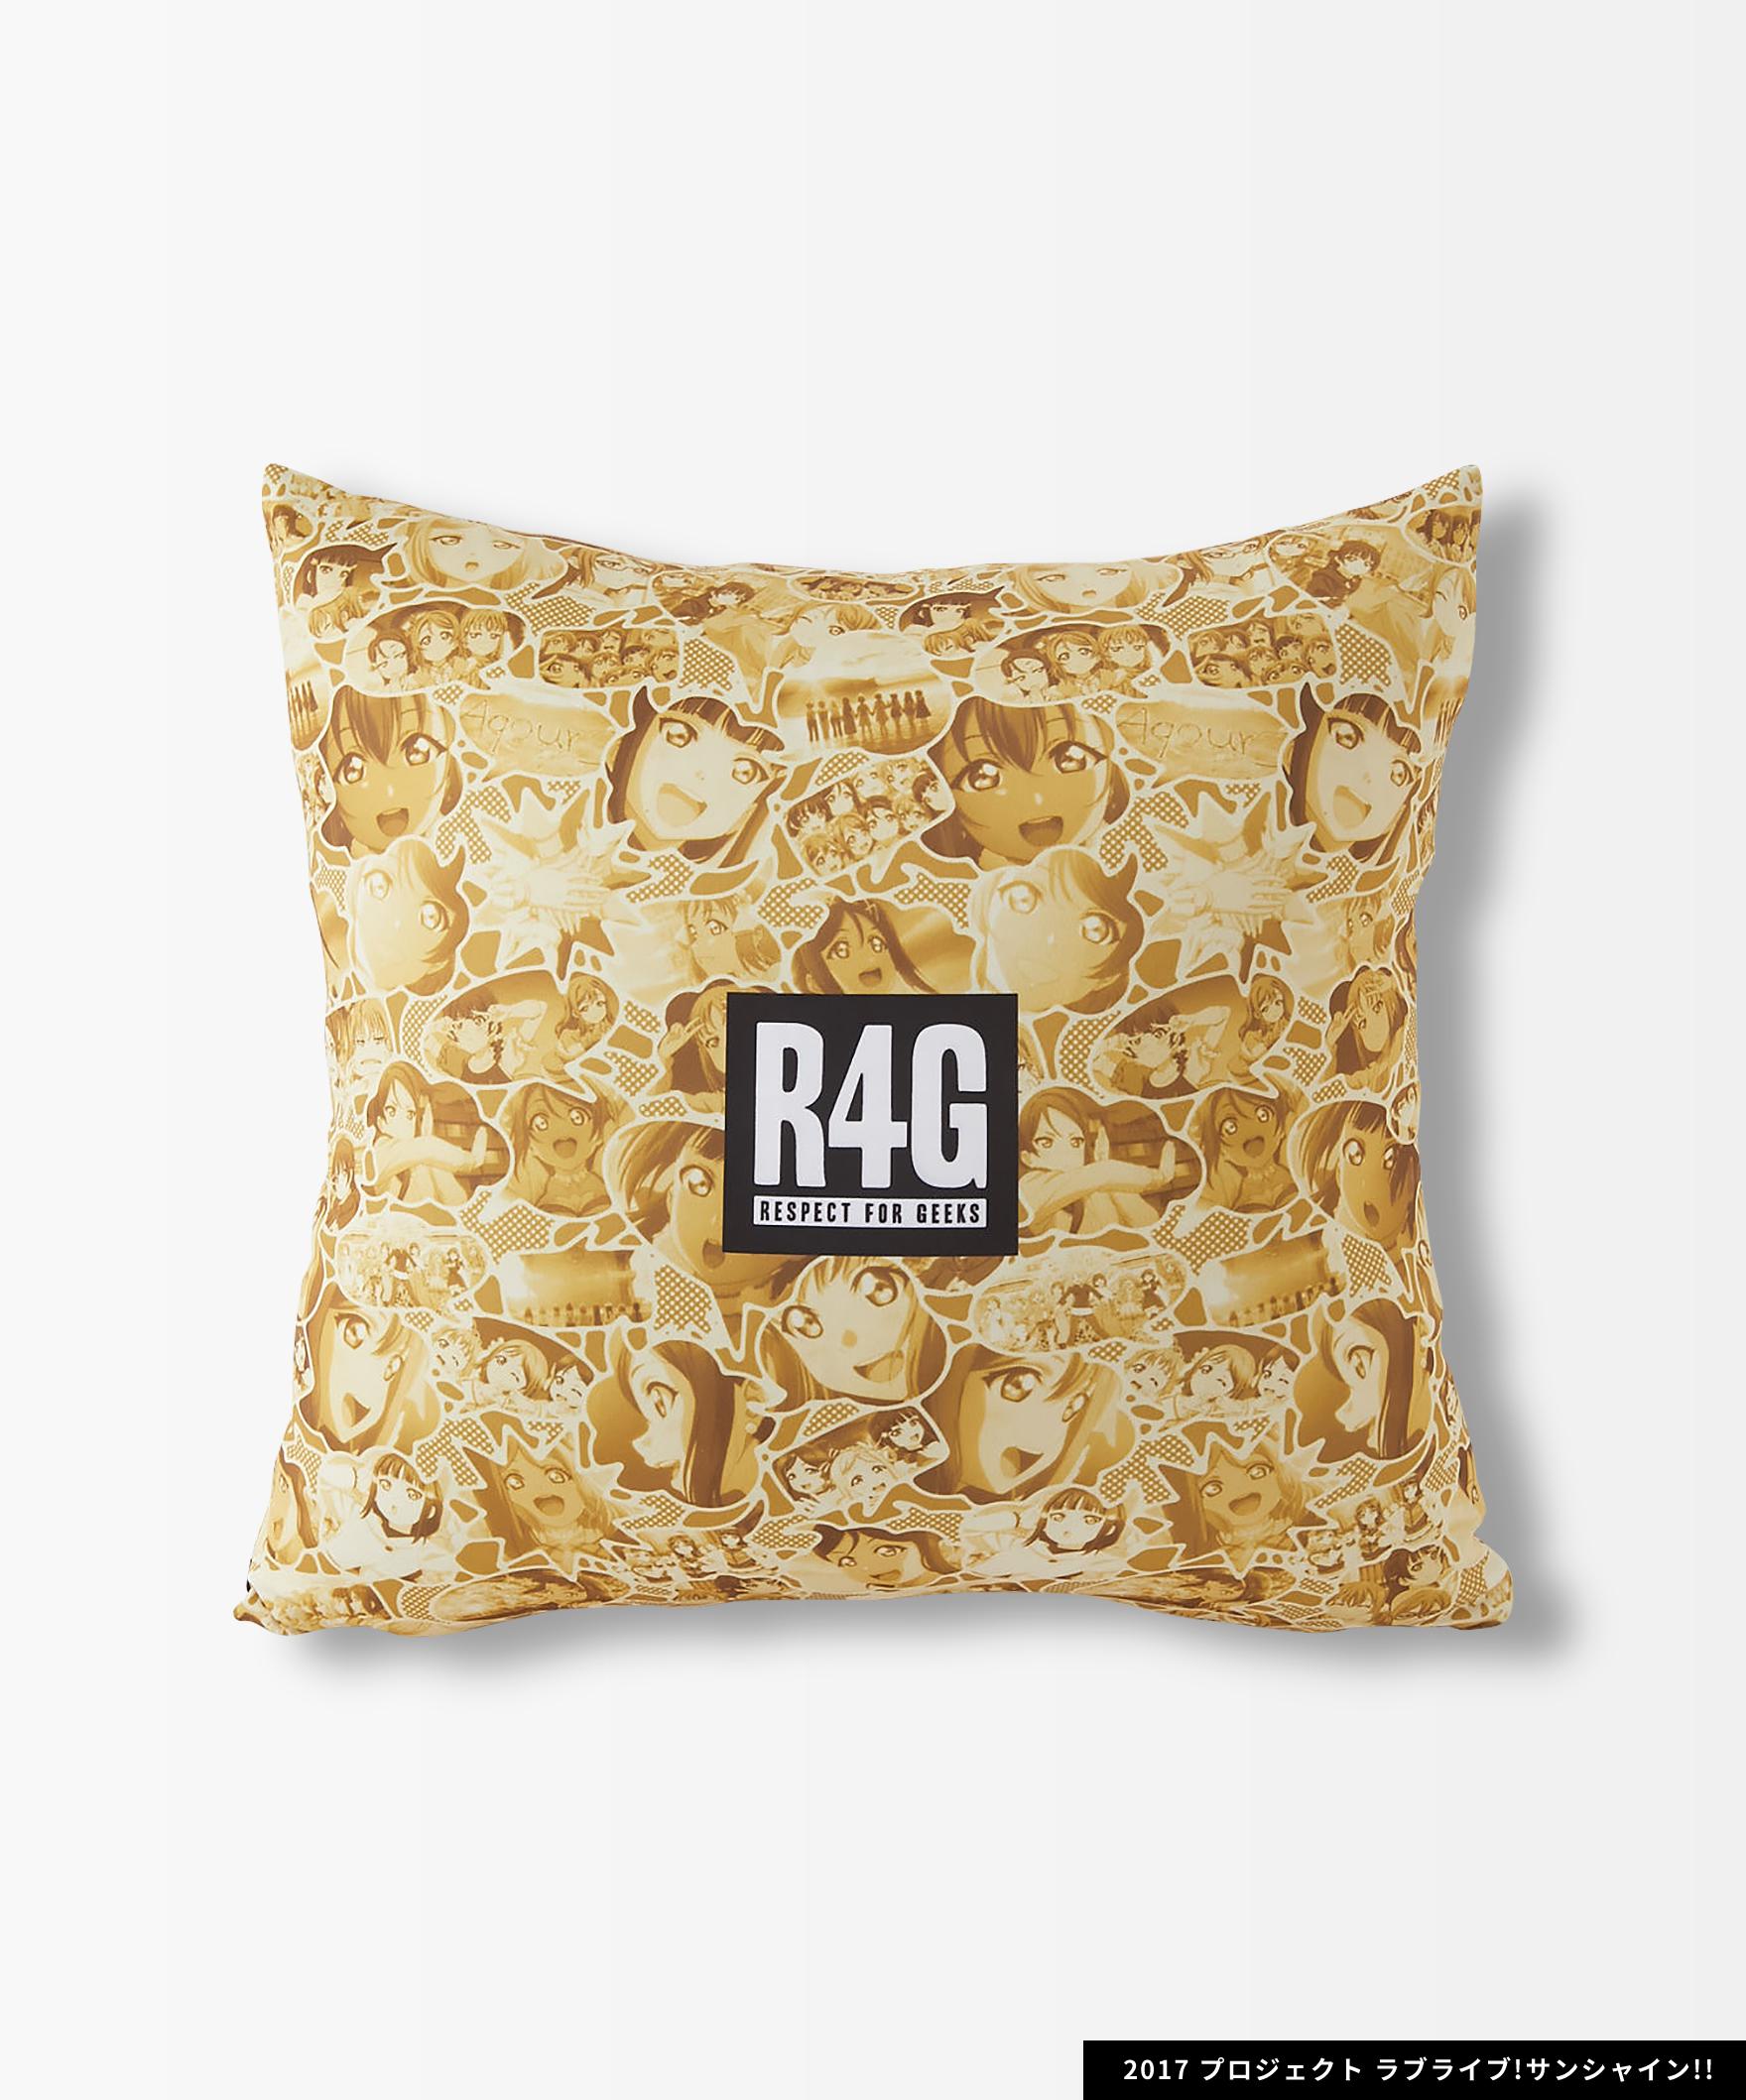 Aqours×R4G Cushion Cover(YEL)